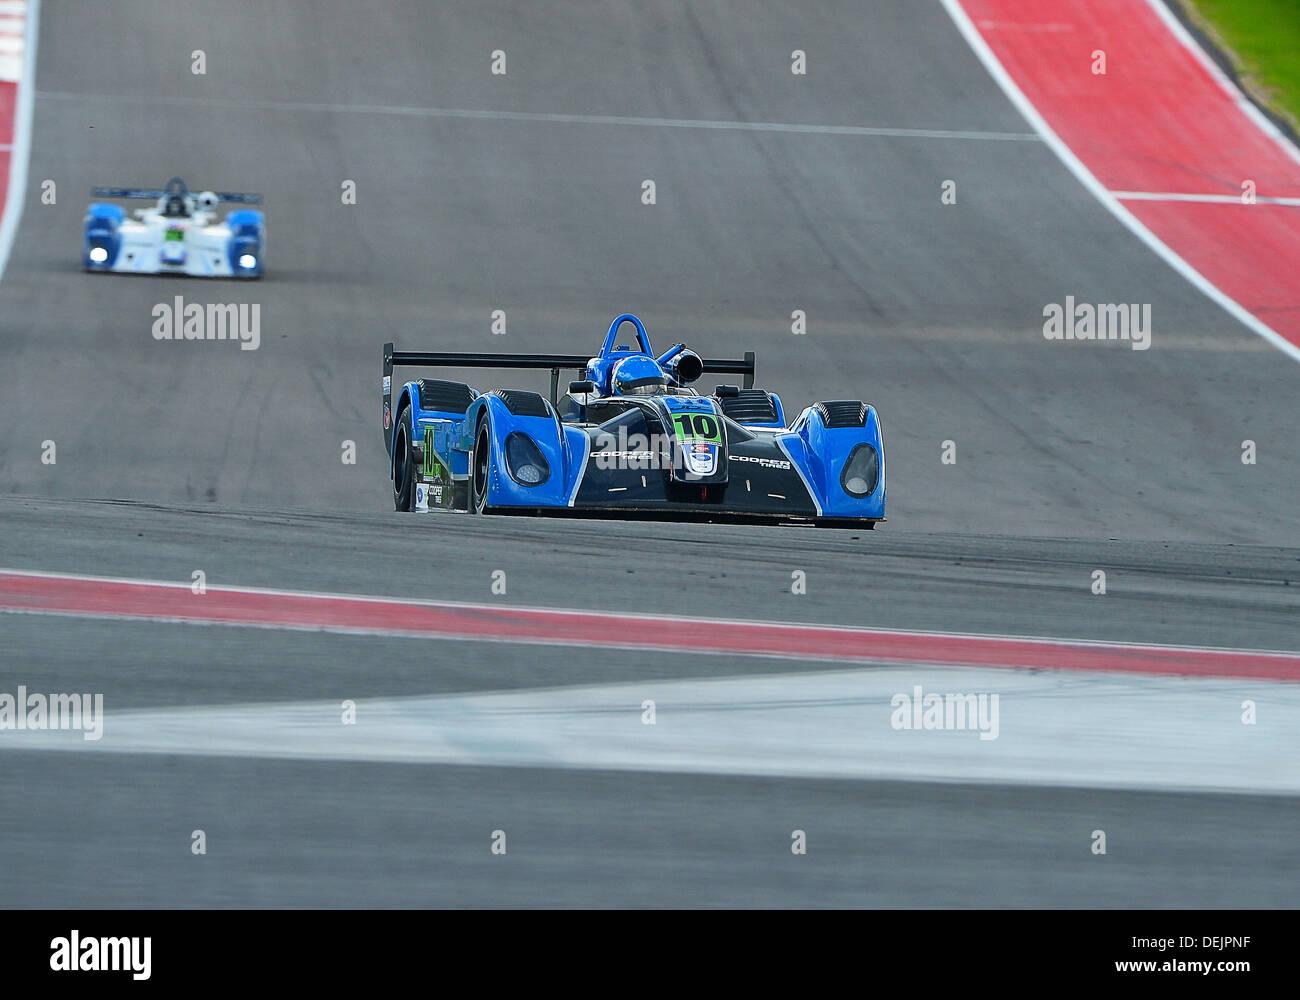 Austin, TX, USA. 19th Sep, 2013. September 19, 2013 .Mikhail Goikhberg / Vancouver, BC of JDC Motorsports driving Stock Photo